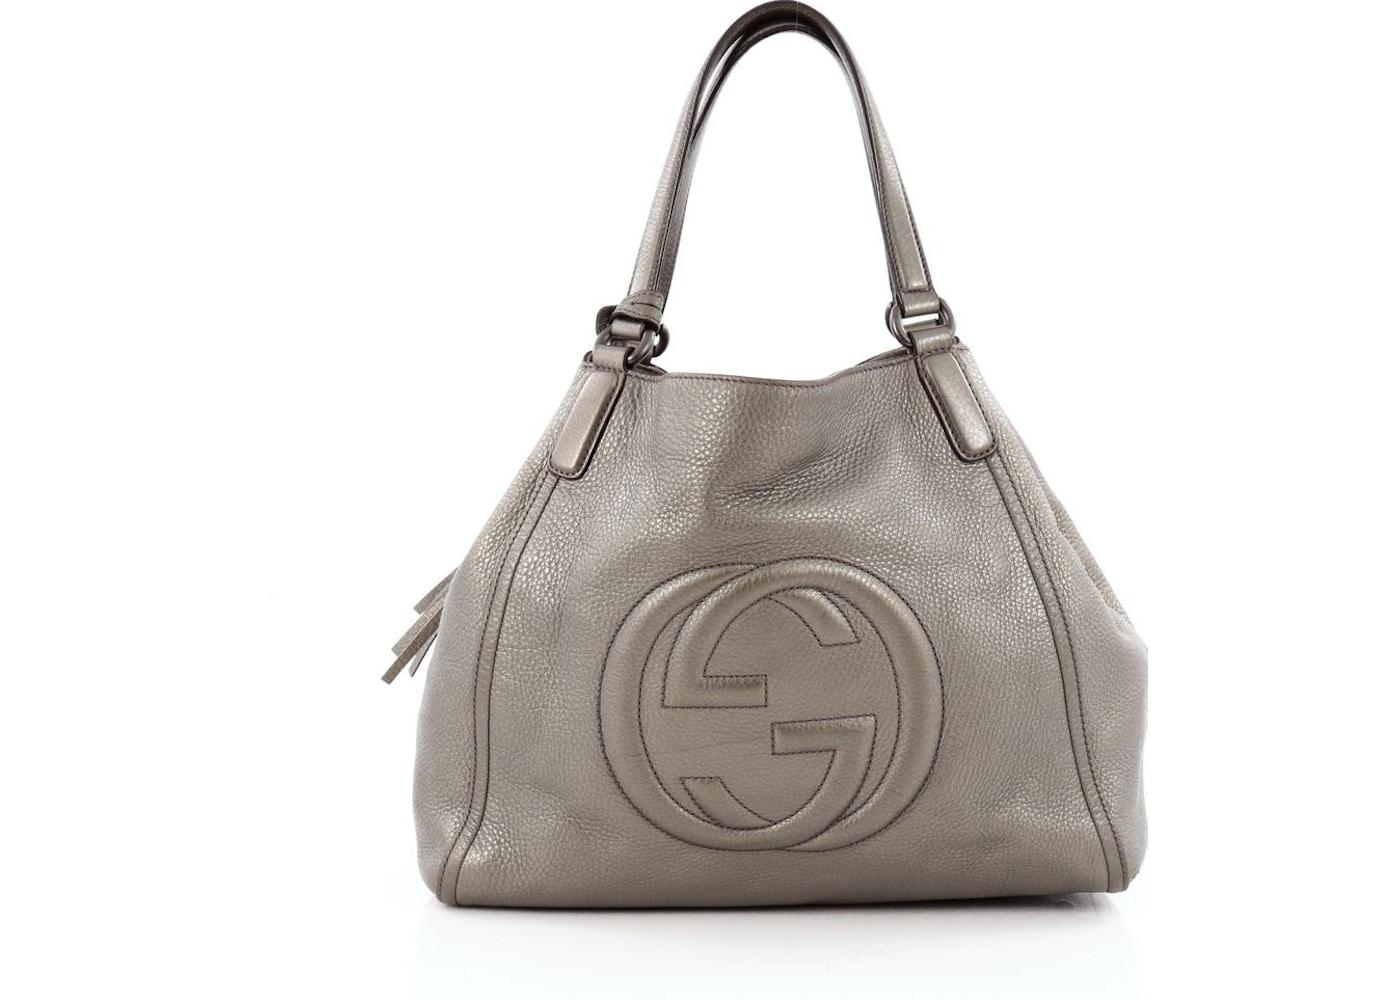 89a4110de Gucci Soho Shoulder Bag GG Interlocking GG Logo Stitched Medium ...